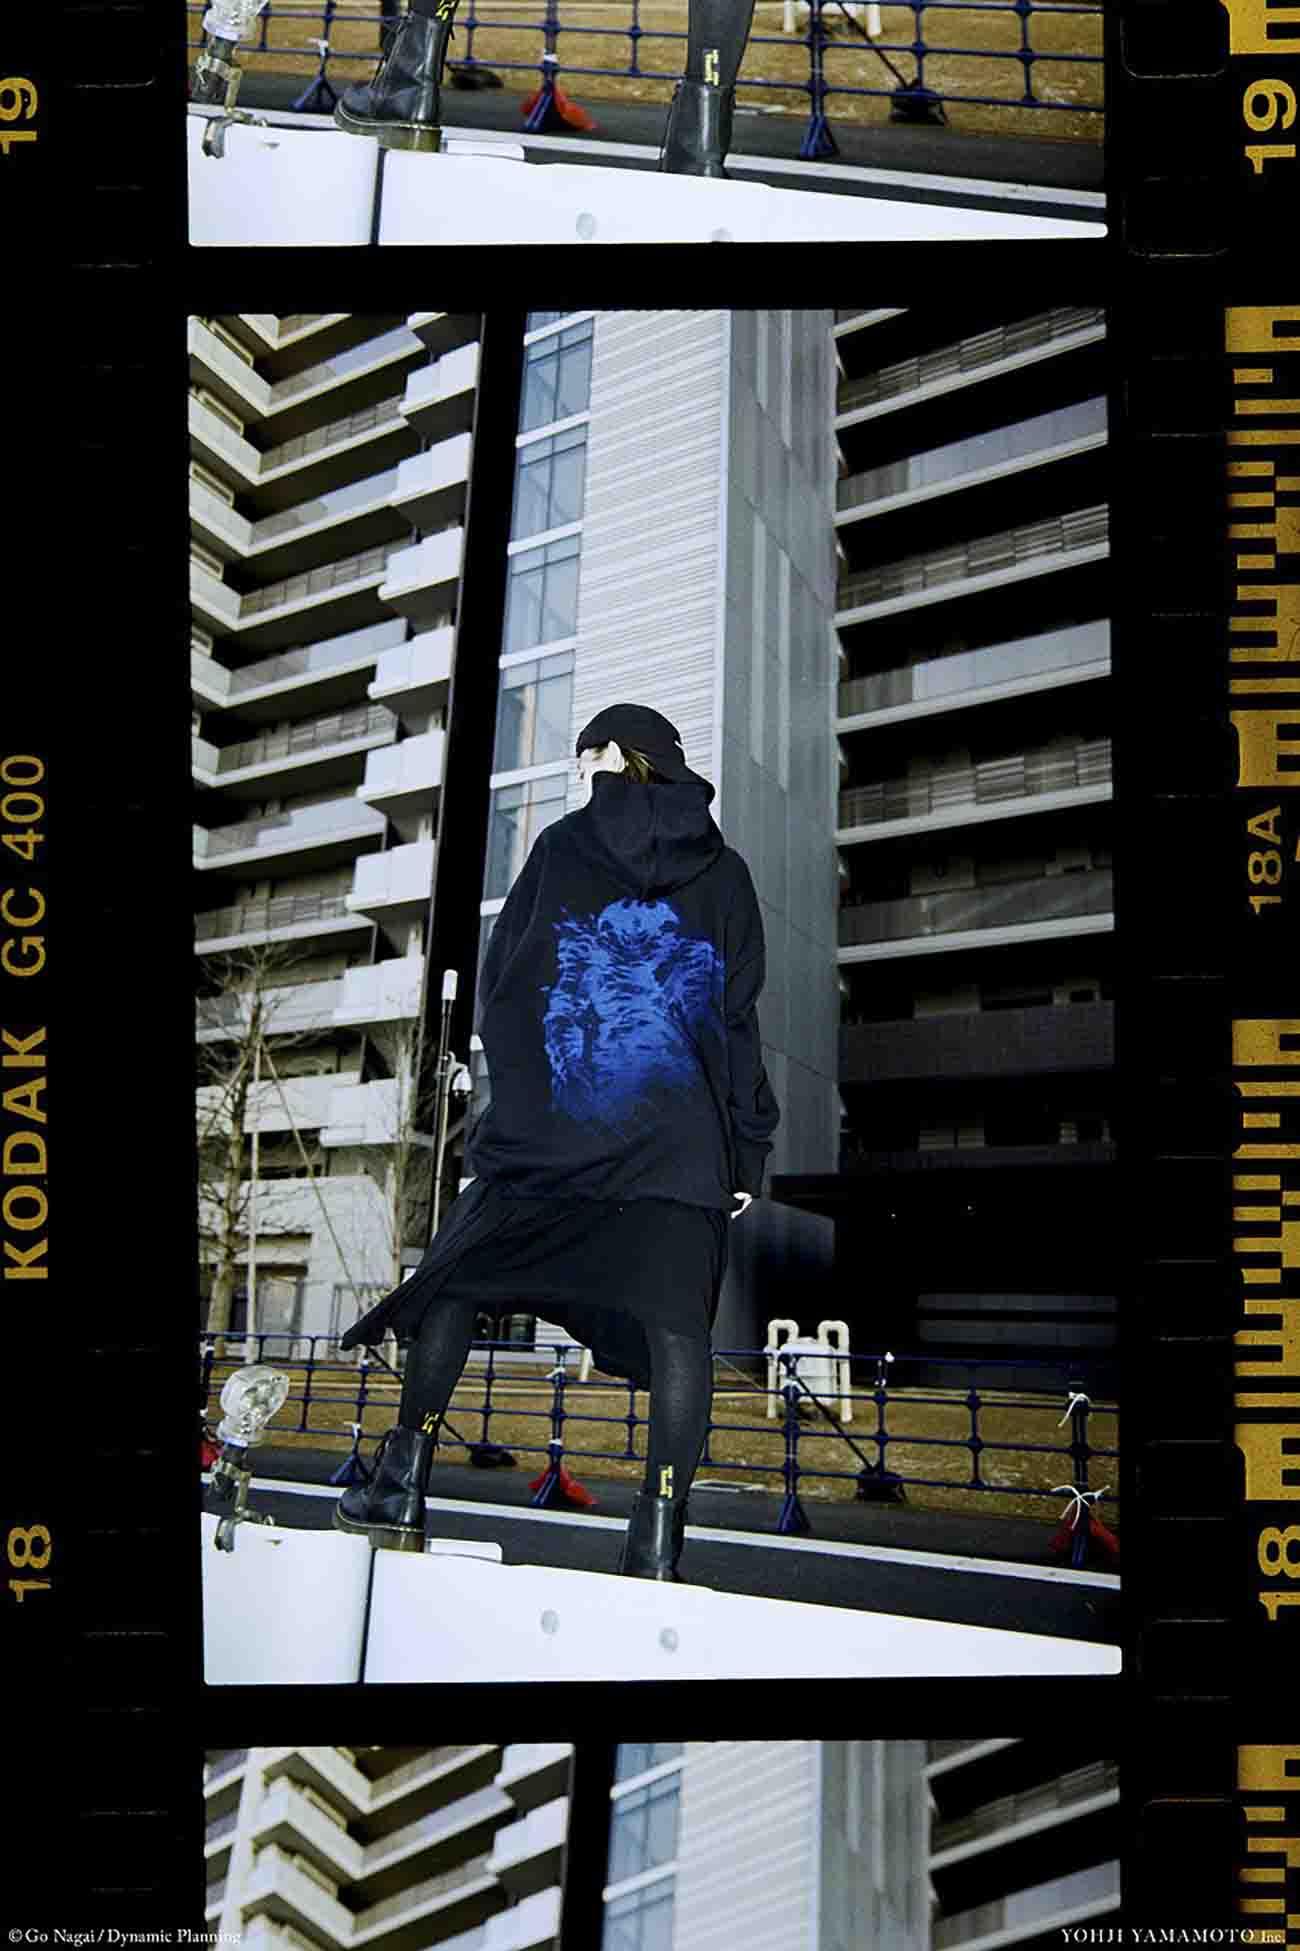 DEVILMAN-デビルマン- Collaboration Short Hoodie